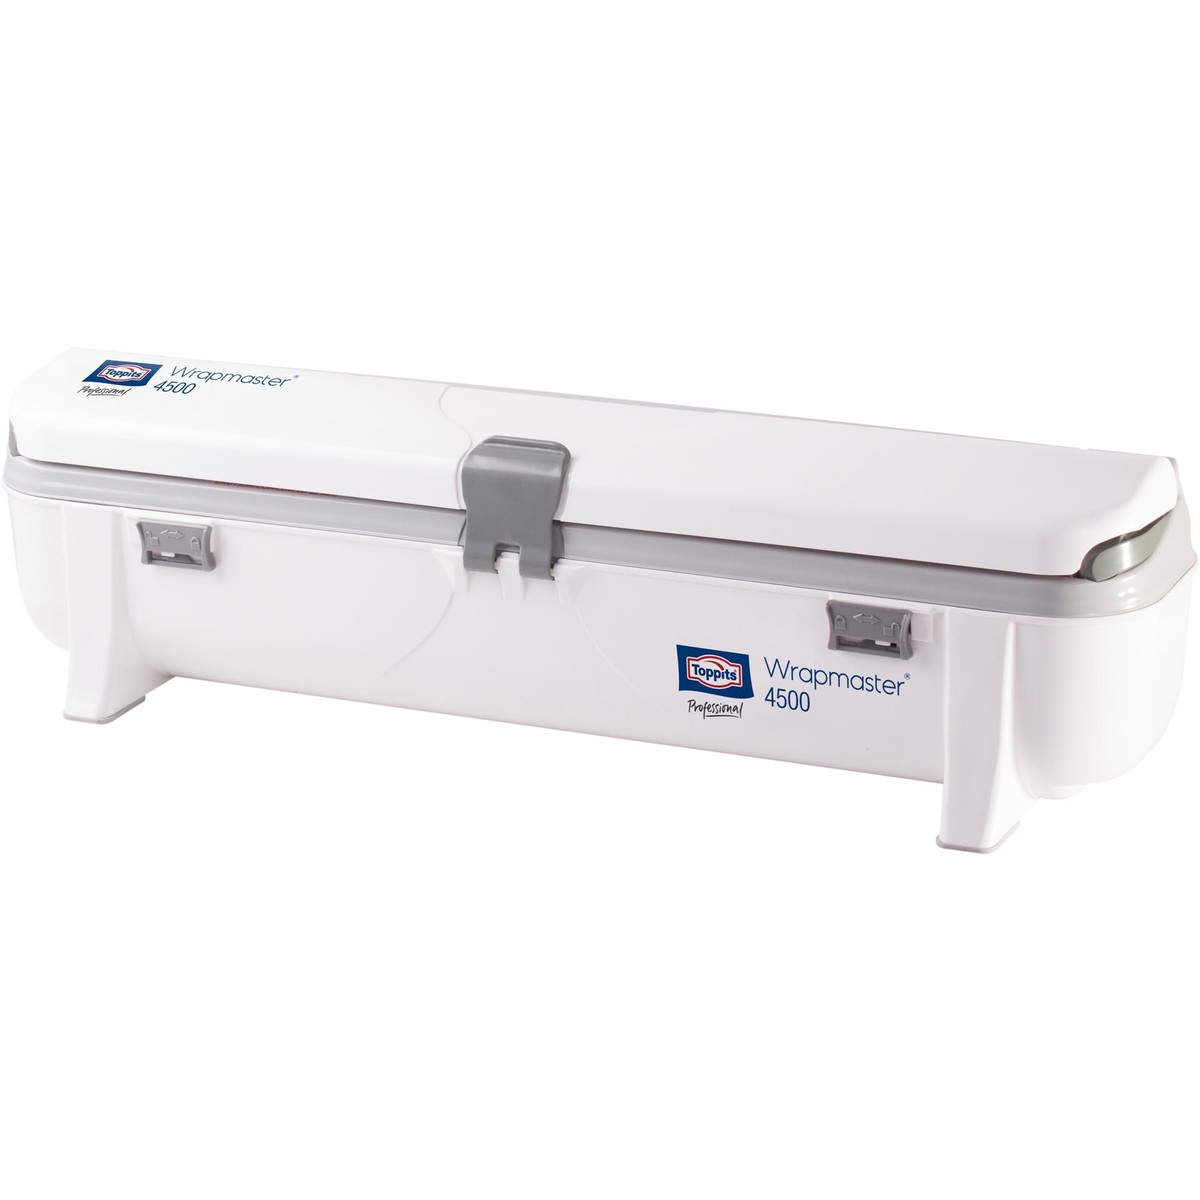 Folienspender Wrapmaster 4500